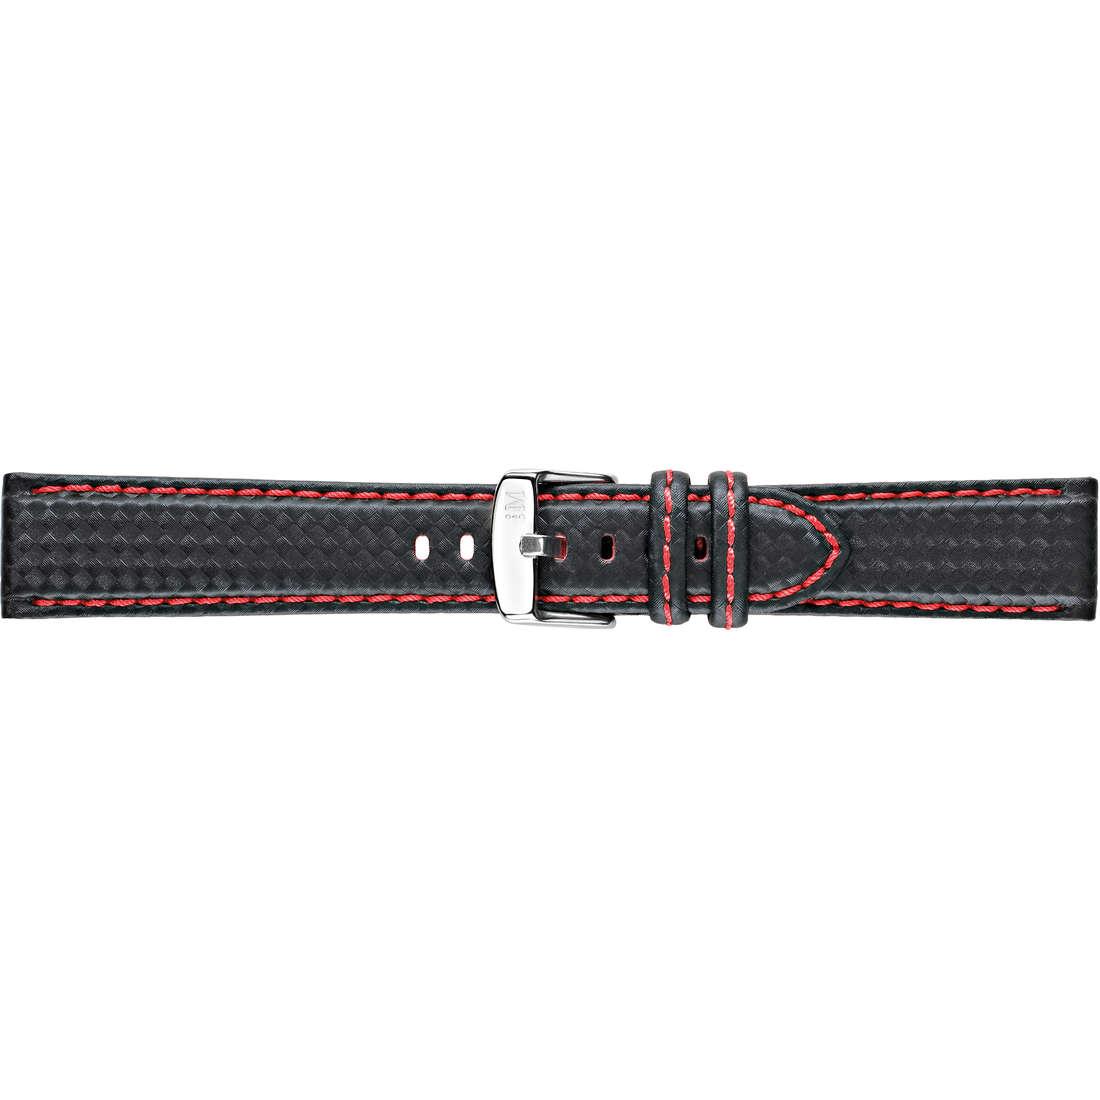 montre bande de montres homme Morellato Linea Sport A01U3586977883CR24